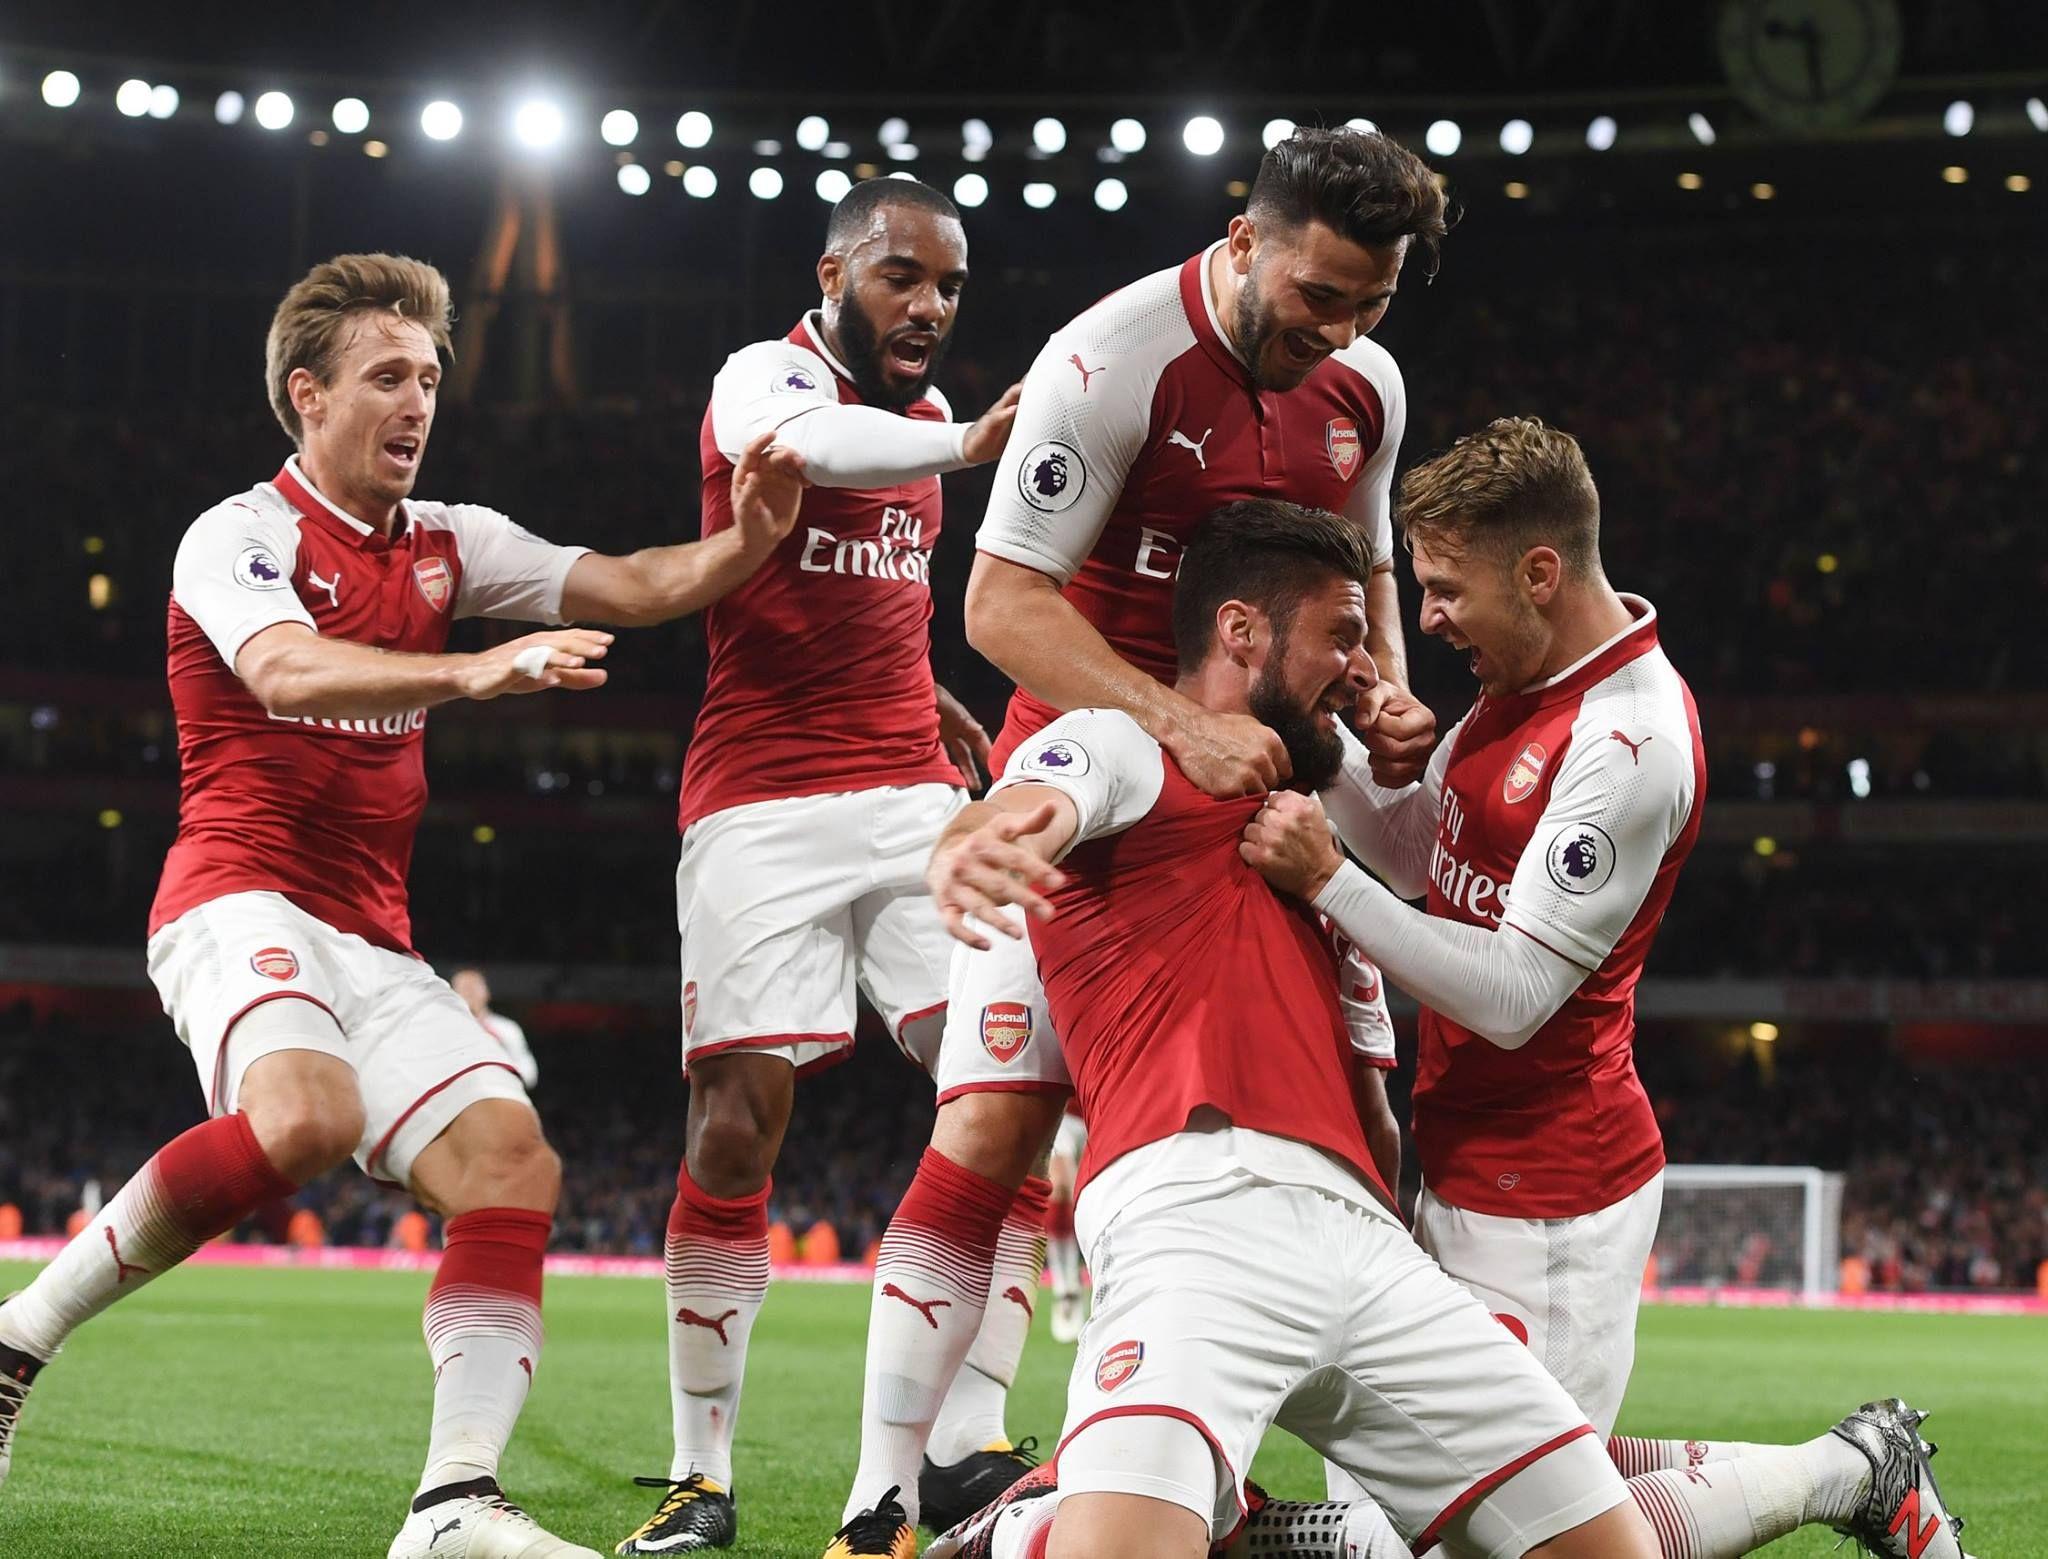 Tottenham Vs Leicester Ao Vivo: Arsenal 4-3 Leicester City (August 2017)